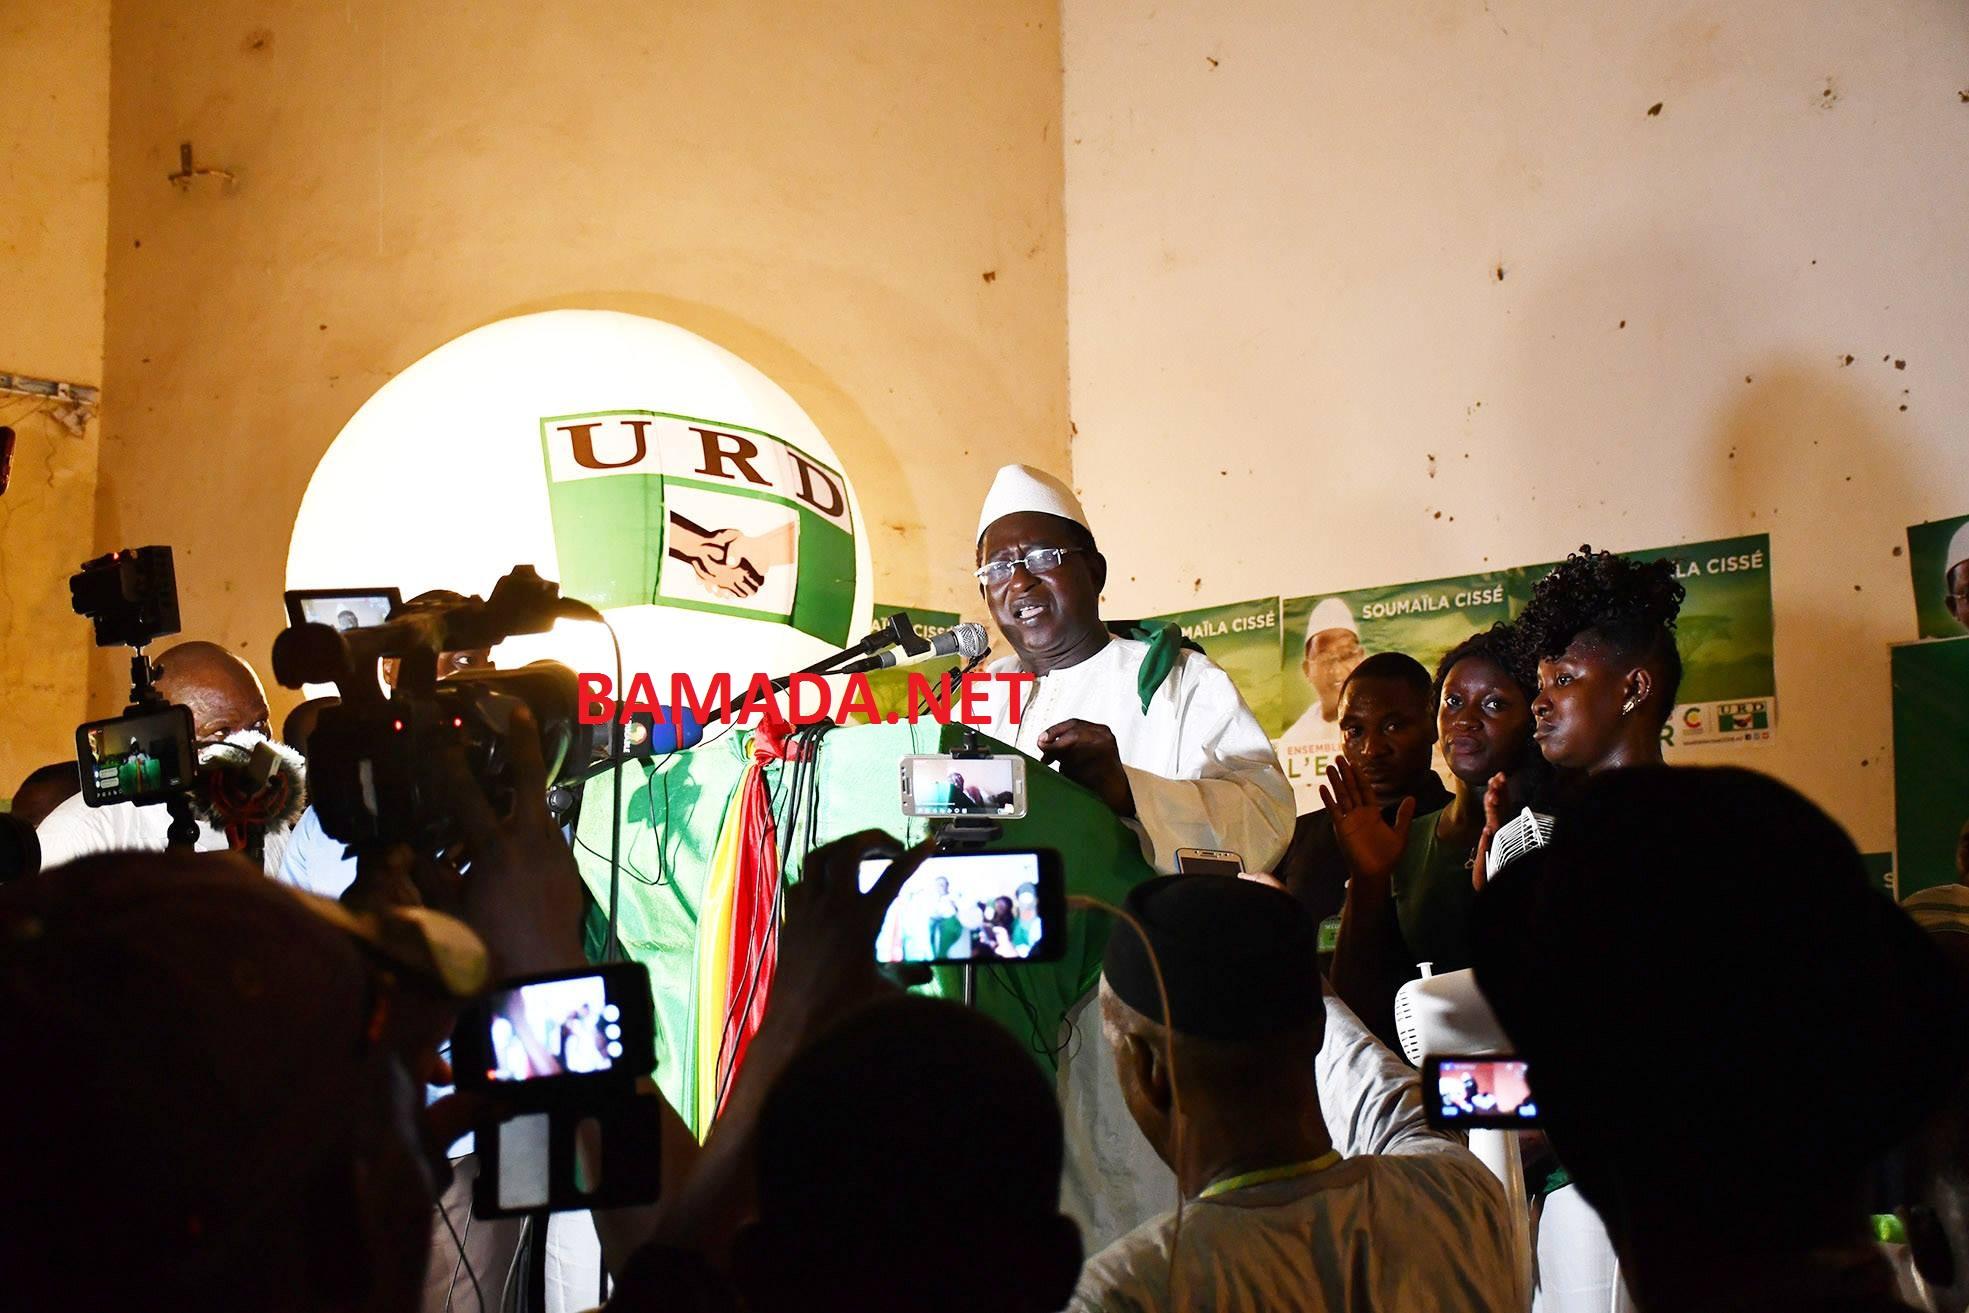 campagne-presidentielle-urd-soumaila-cisse-kayes-espoir-mamadou-hawa-gassama-depute-qg-discours